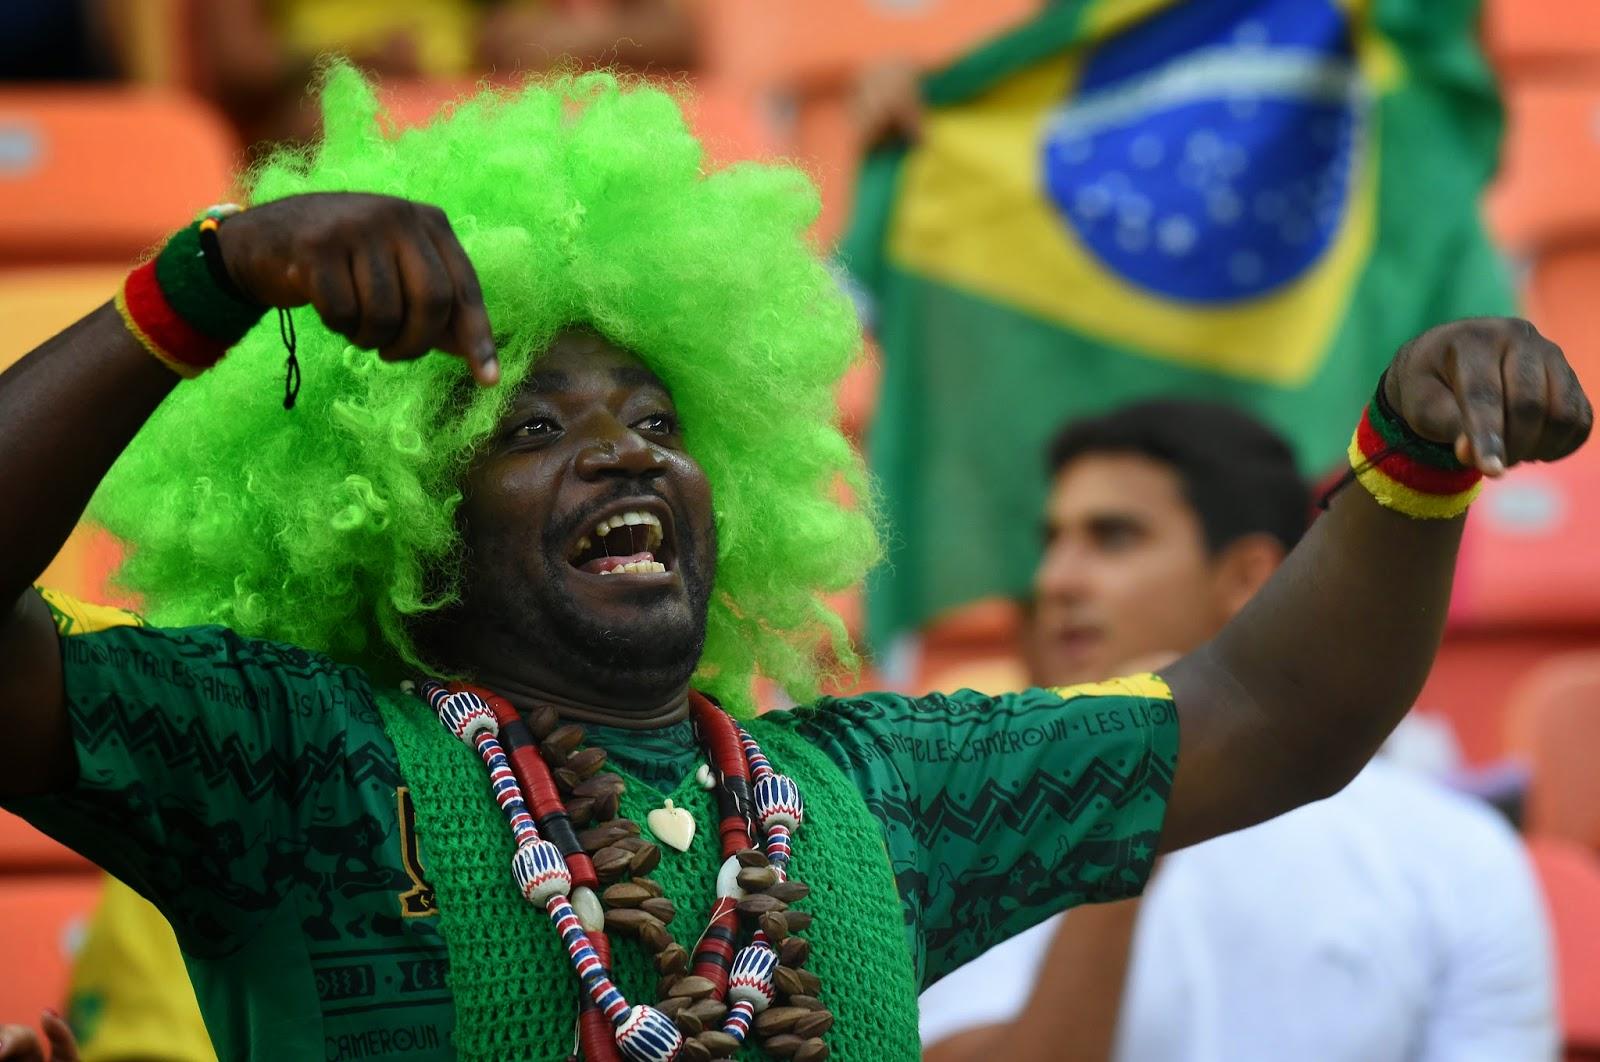 Alexandre Song, Brazil, Cameroon Match, Croatia Match, Croatia vs Cameroon, Dejan Lovren, FIFA World Cup, FIFA World Cup 2014, Football, Group A, Mario Mandzukic, Niko Kova, Pierre Webo, Sports, Volker Finke,